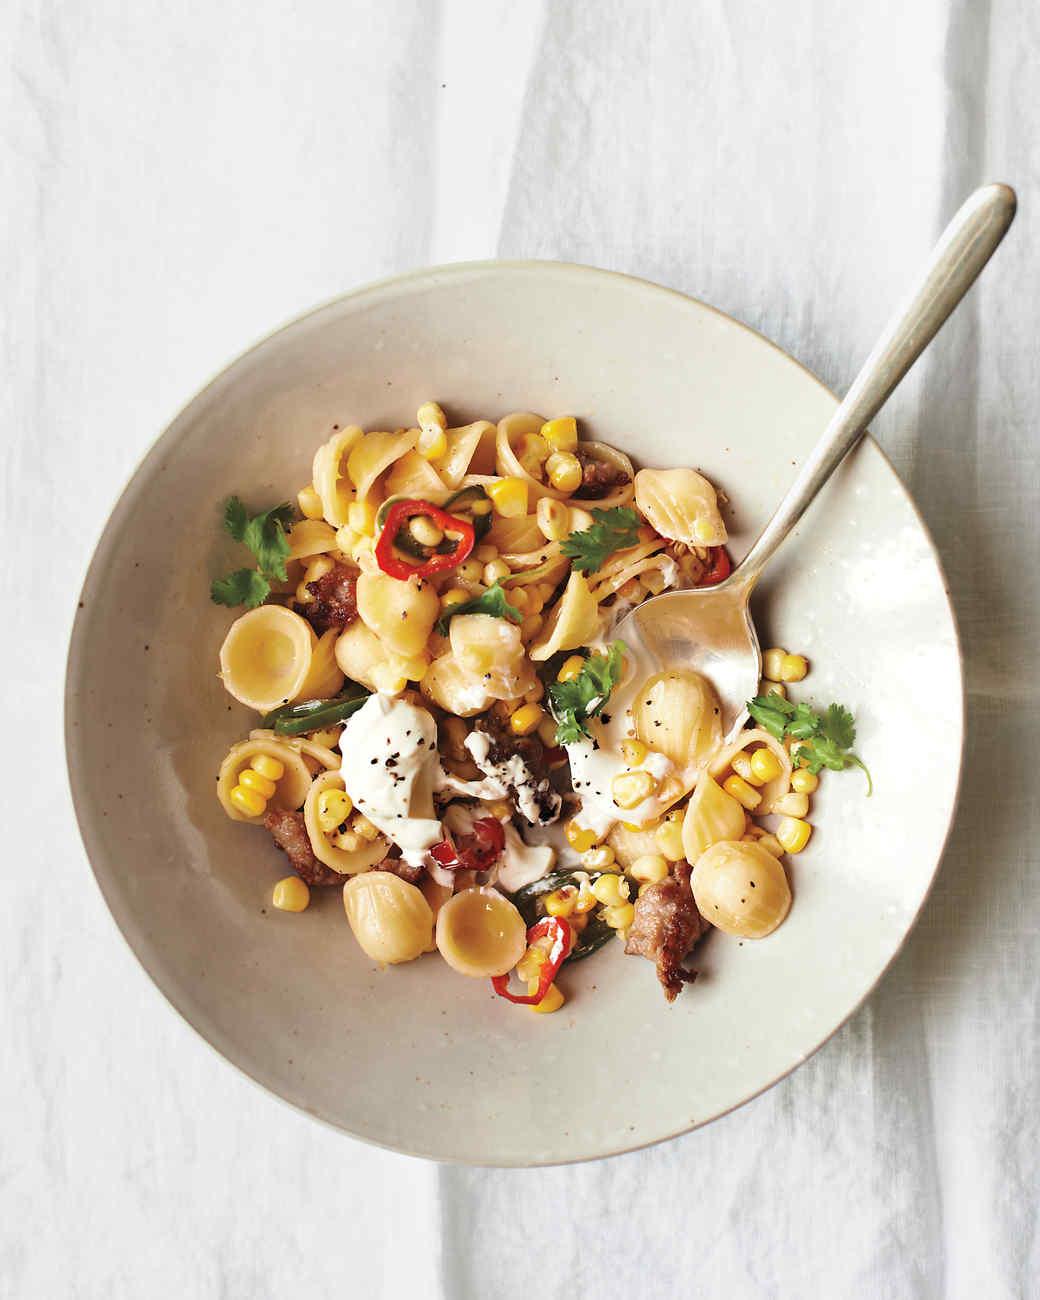 msl-food-entertaining-whats-for-dinner-noodles-orecchiette-md110135.jpg